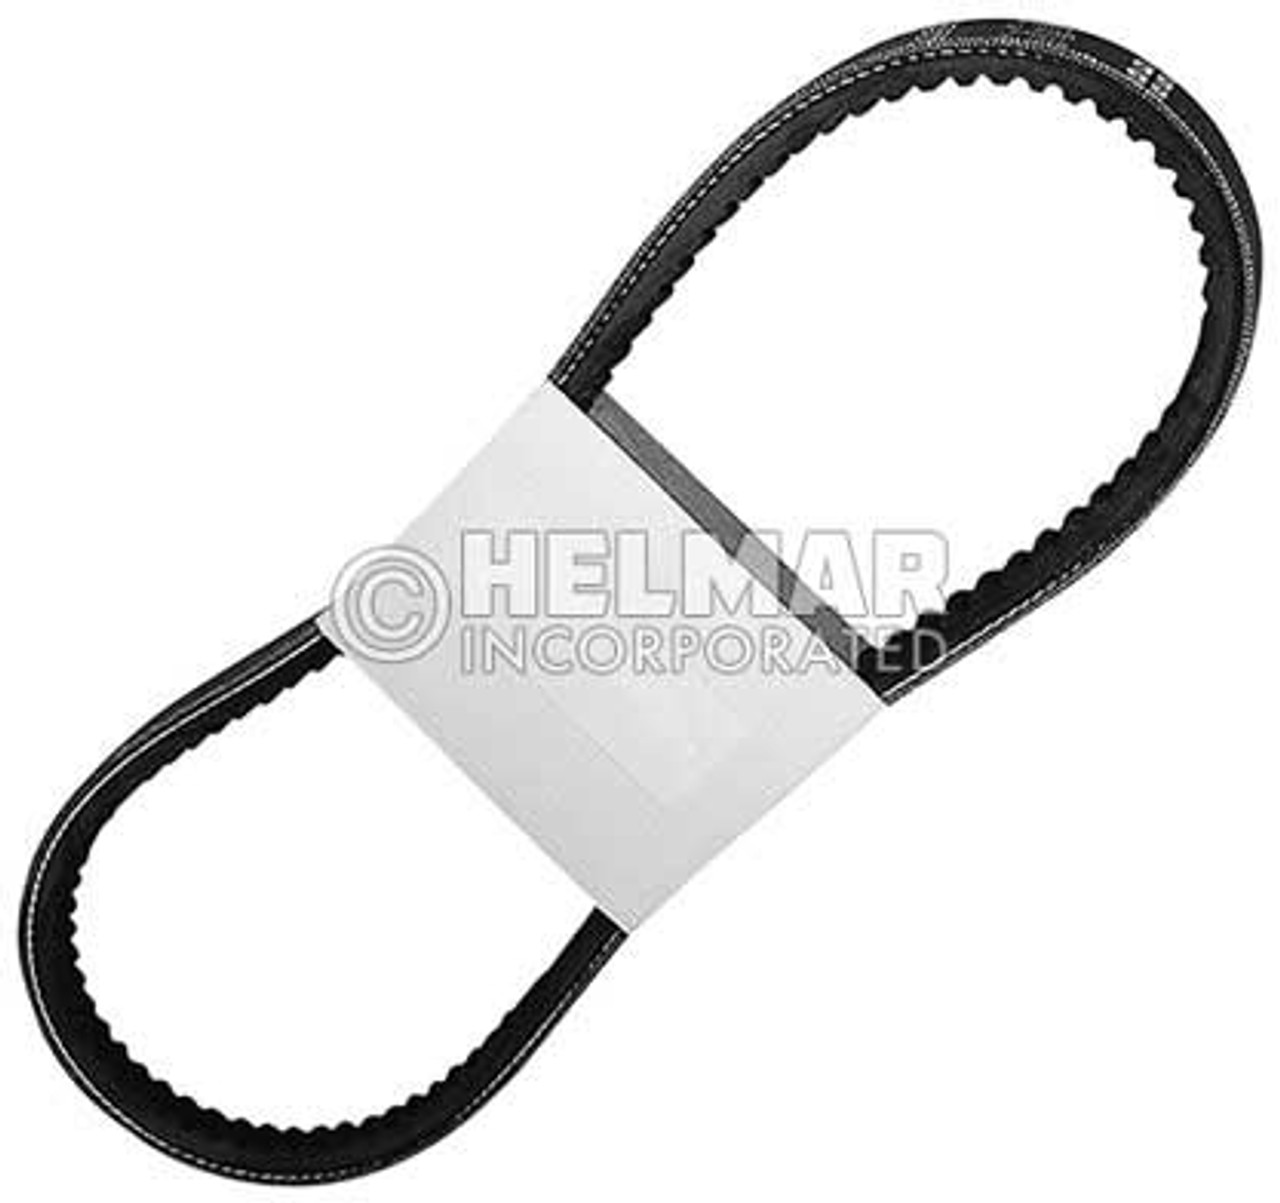 05910-10046 Mitsubishi/Caterpillar Fan Belt, S4S Engines